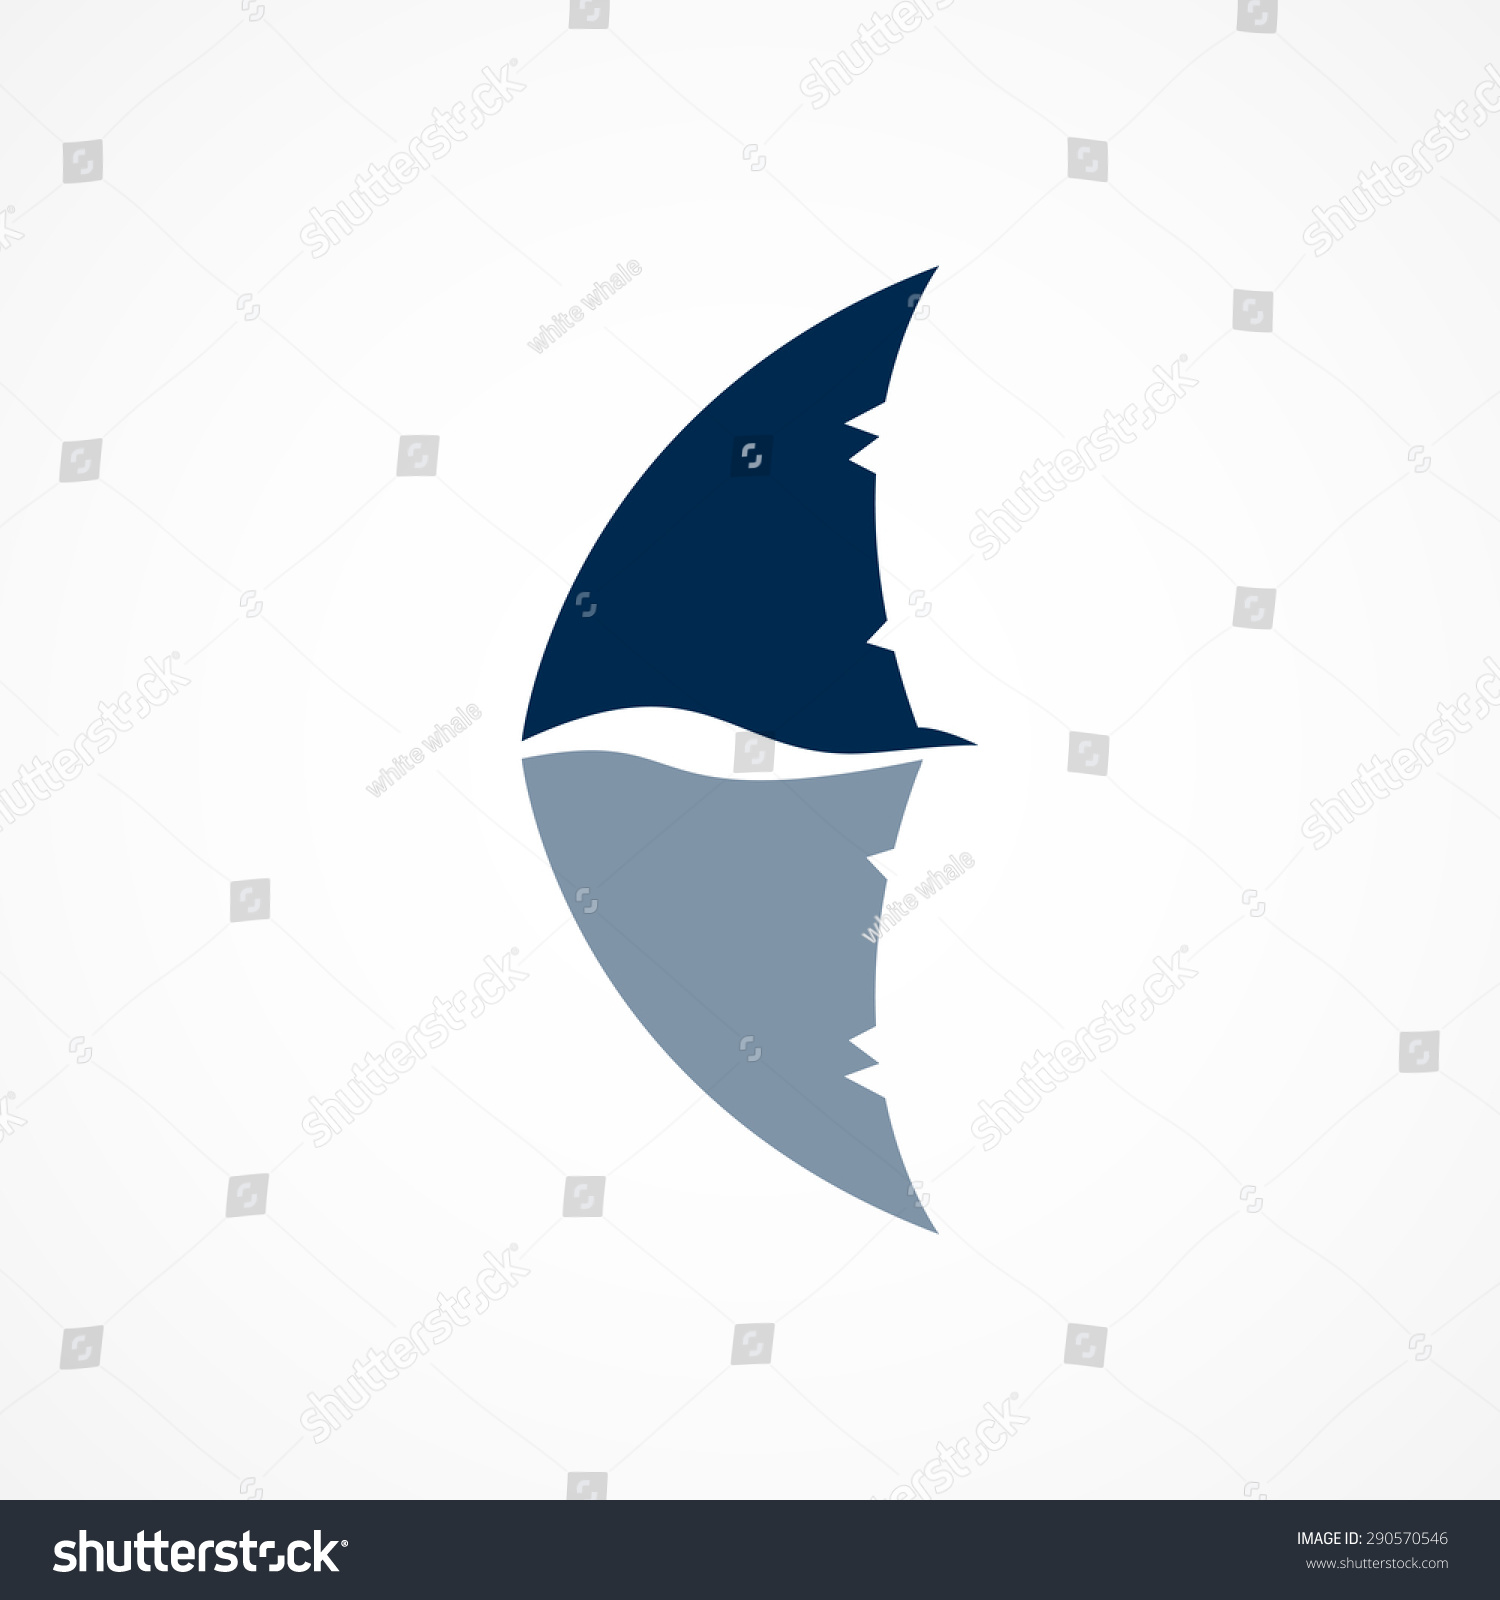 shark fin white background - photo #3